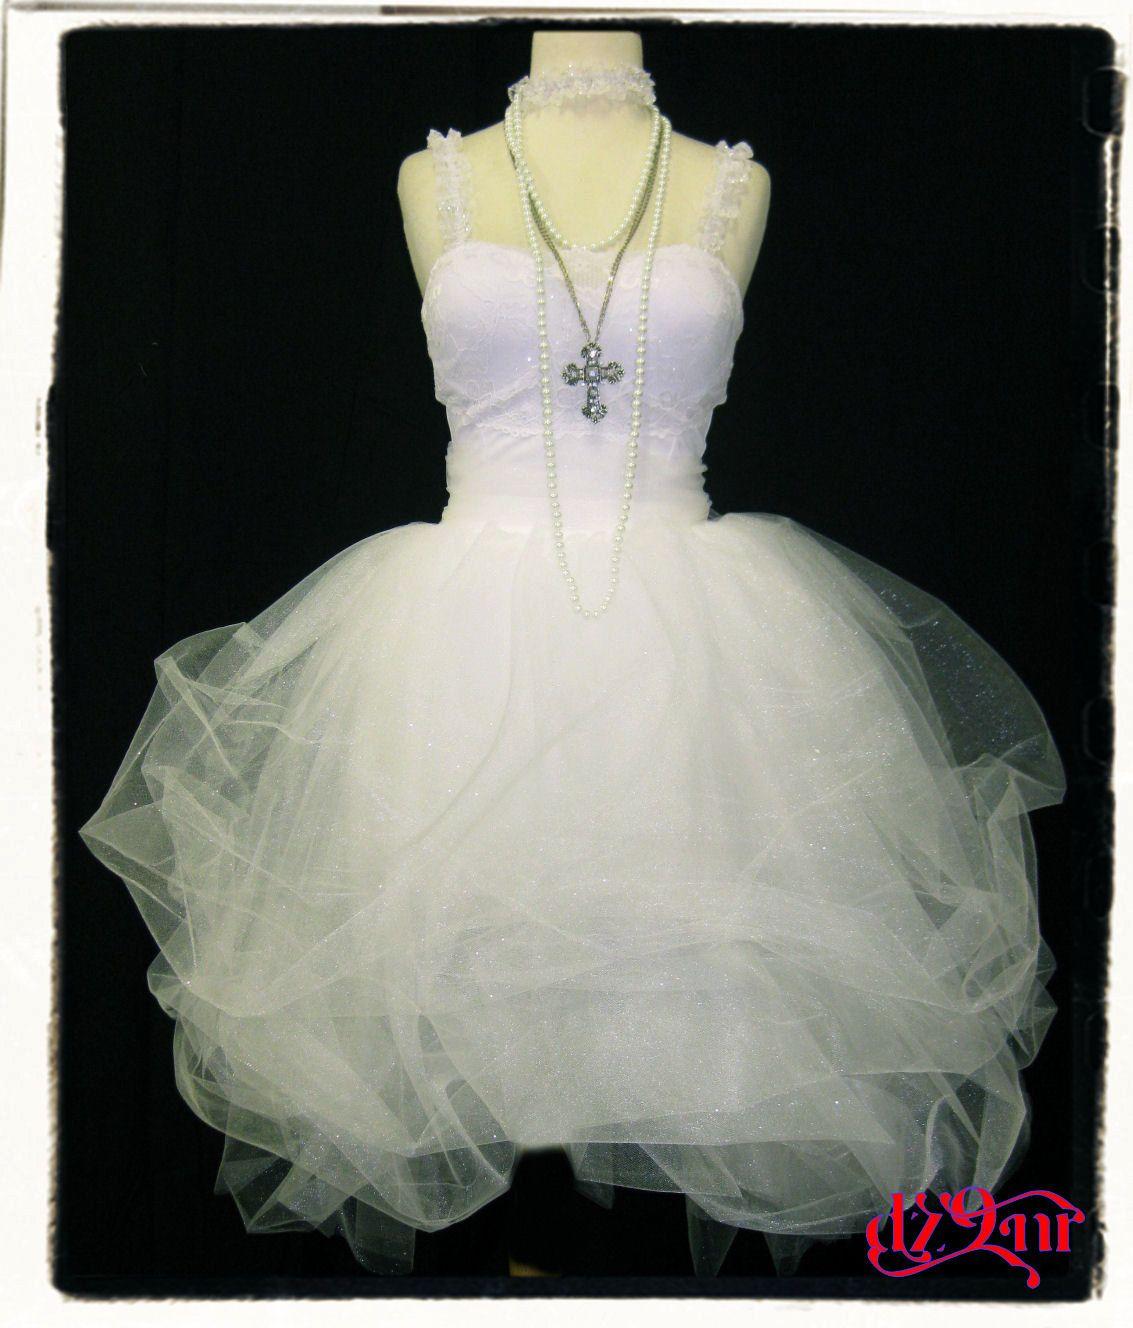 80\'s Prom Dress~ Madonna Like a Virgin Outfit- White Bachelorette ...